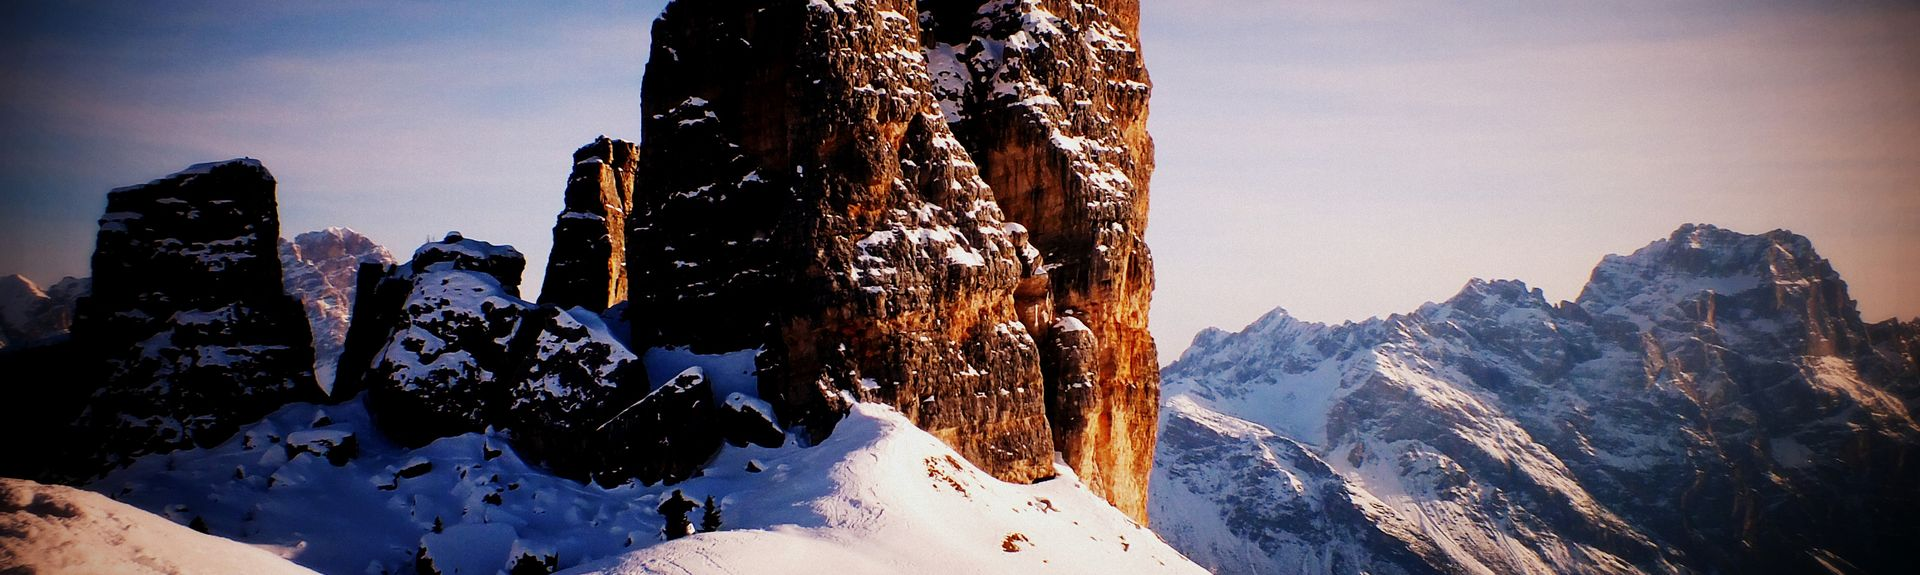 Sextner Dolomiten Alta Pusteria, Comelico Superiore, Veneto, Italy